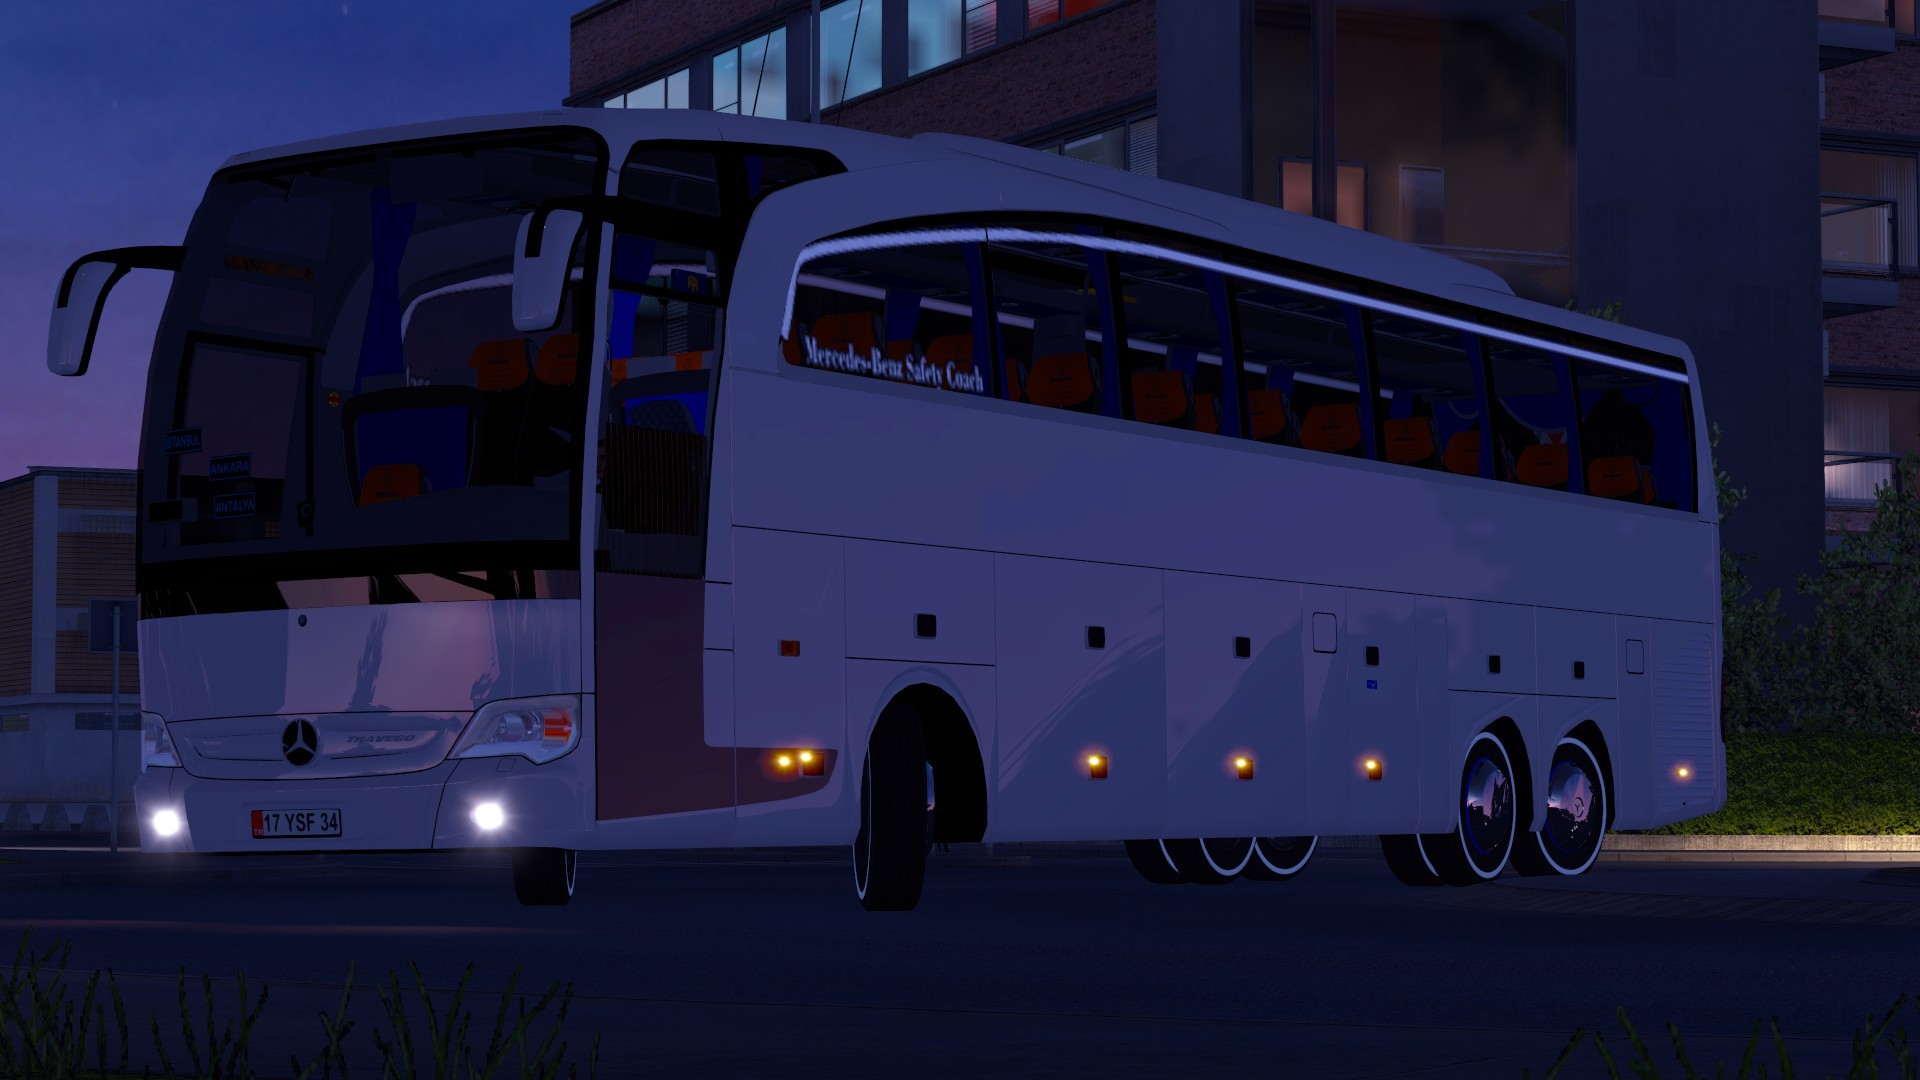 Euro truck simulator 2 mercedes benz travego 15 17 shd v4 for Mercedes benz euro